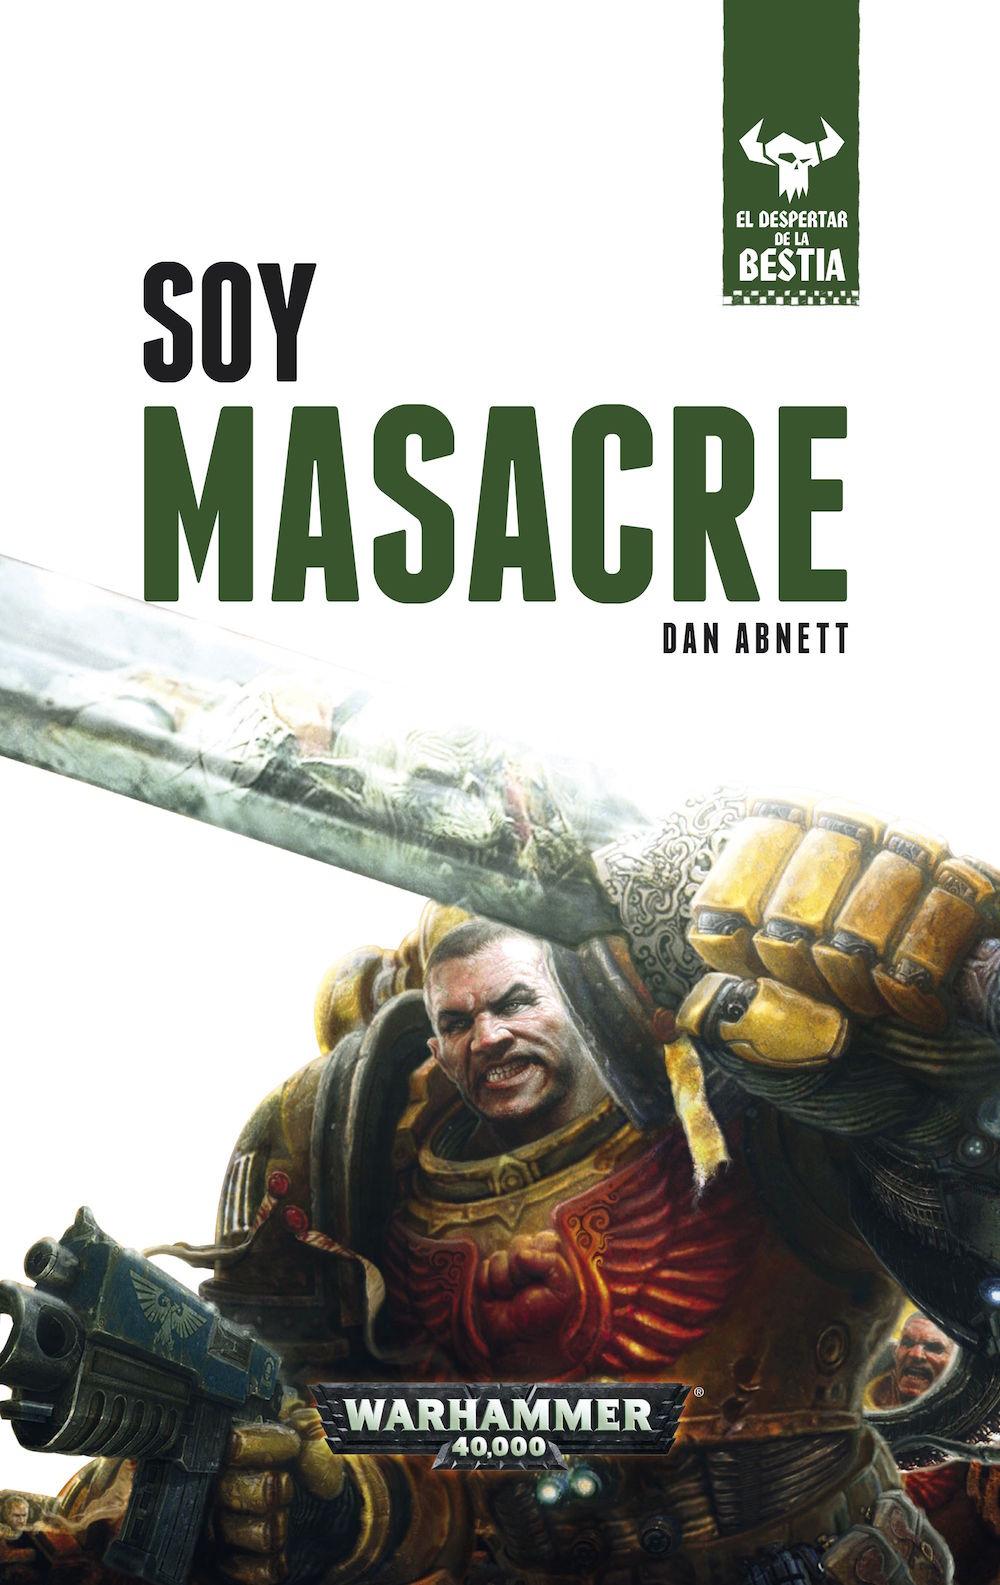 SOY MASACRE (EL DESPERTAR DE LA BESTIA 1)